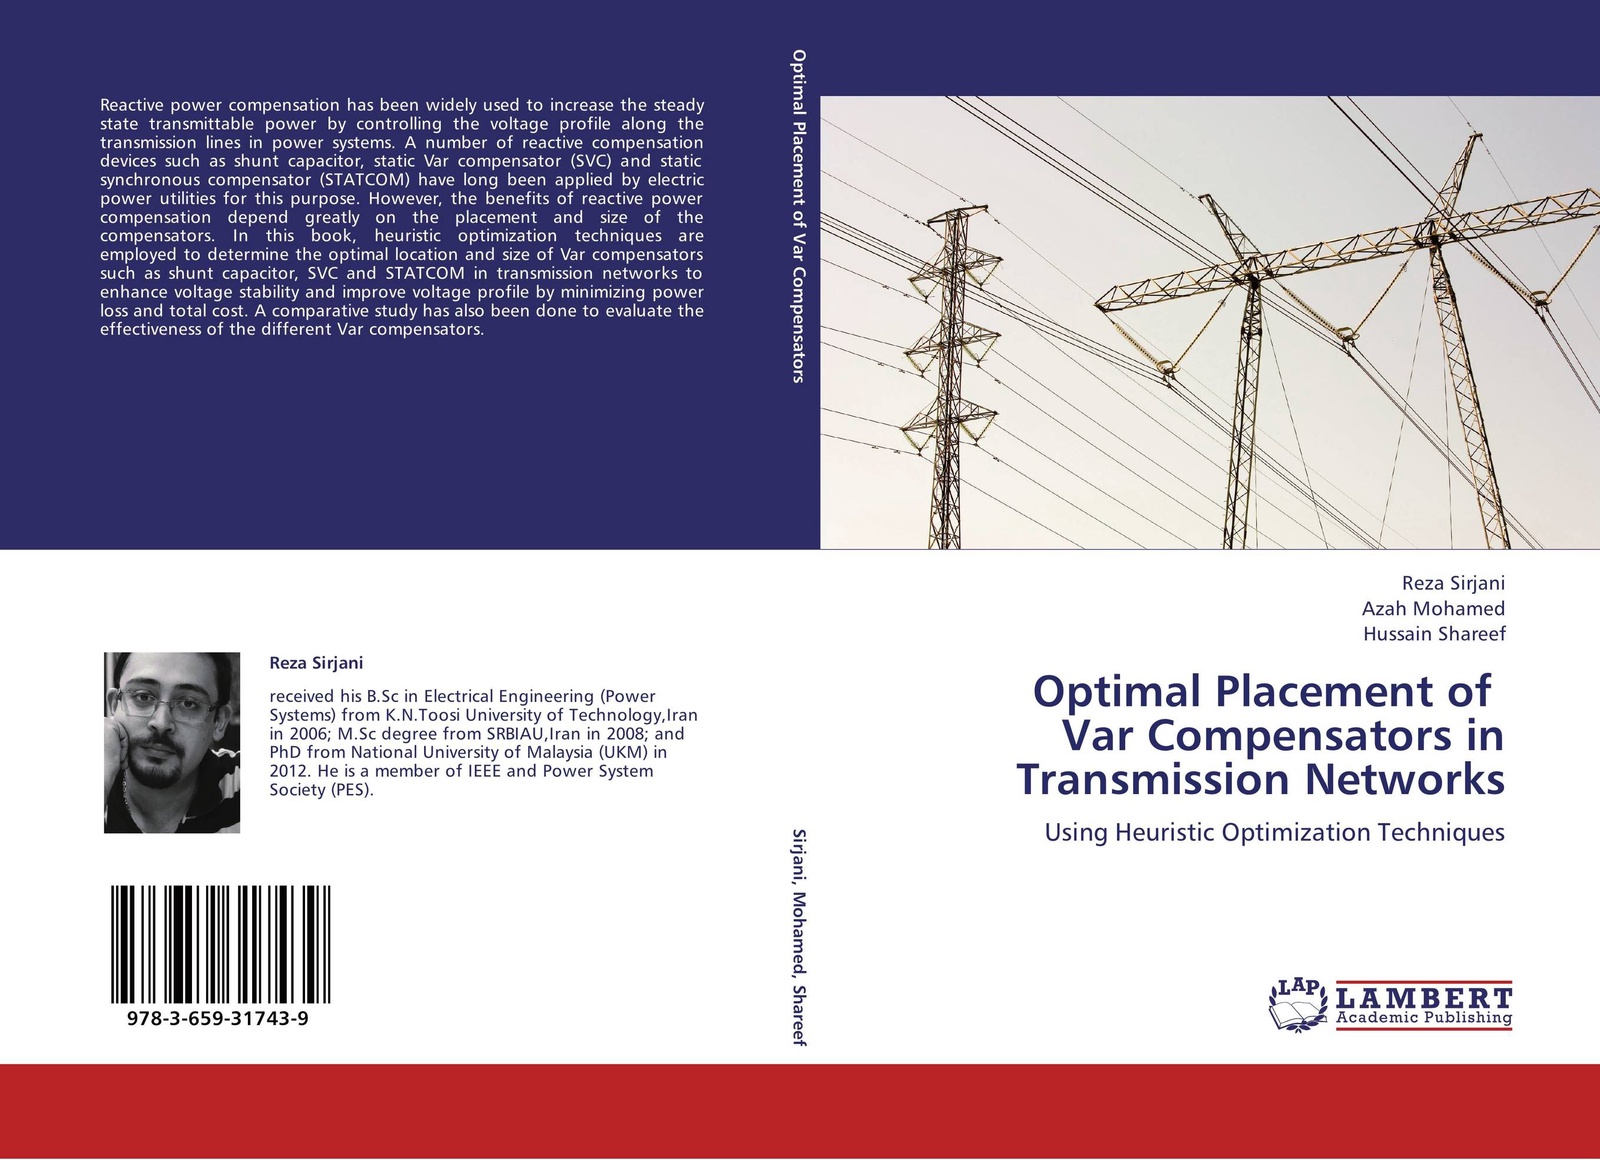 Reza Sirjani,Azah Mohamed and Hussain Shareef Optimal Placement of Var Compensators in Transmission Networks цены онлайн